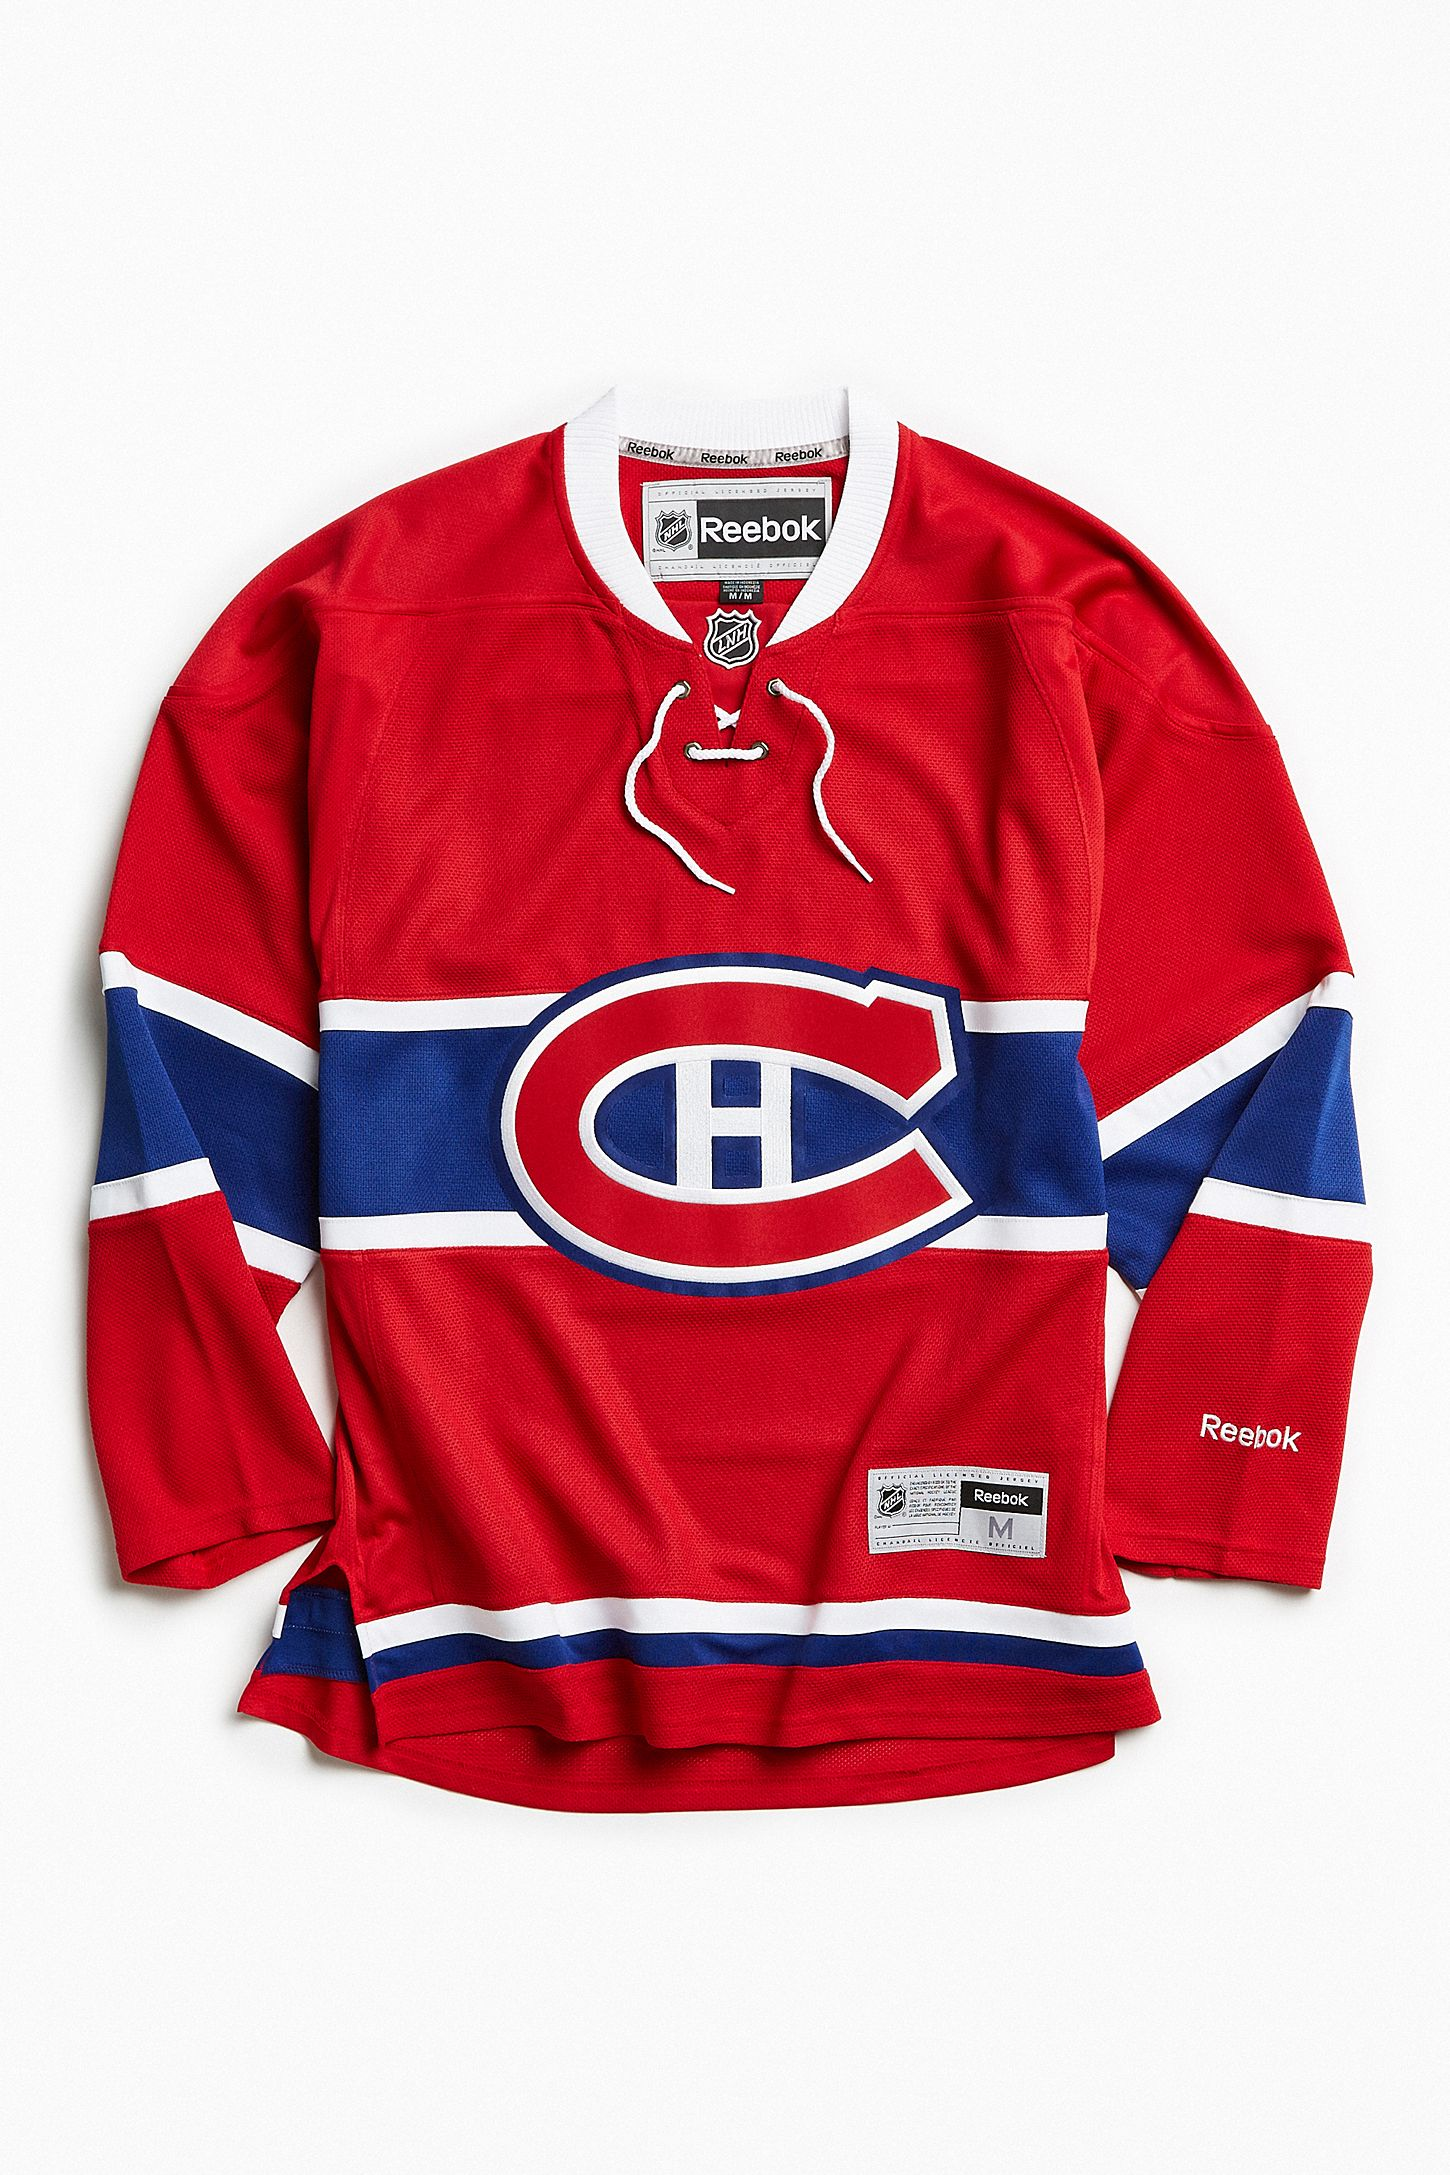 Reebok NHL Montreal Canadiens Hockey Jersey  48fb1be067f